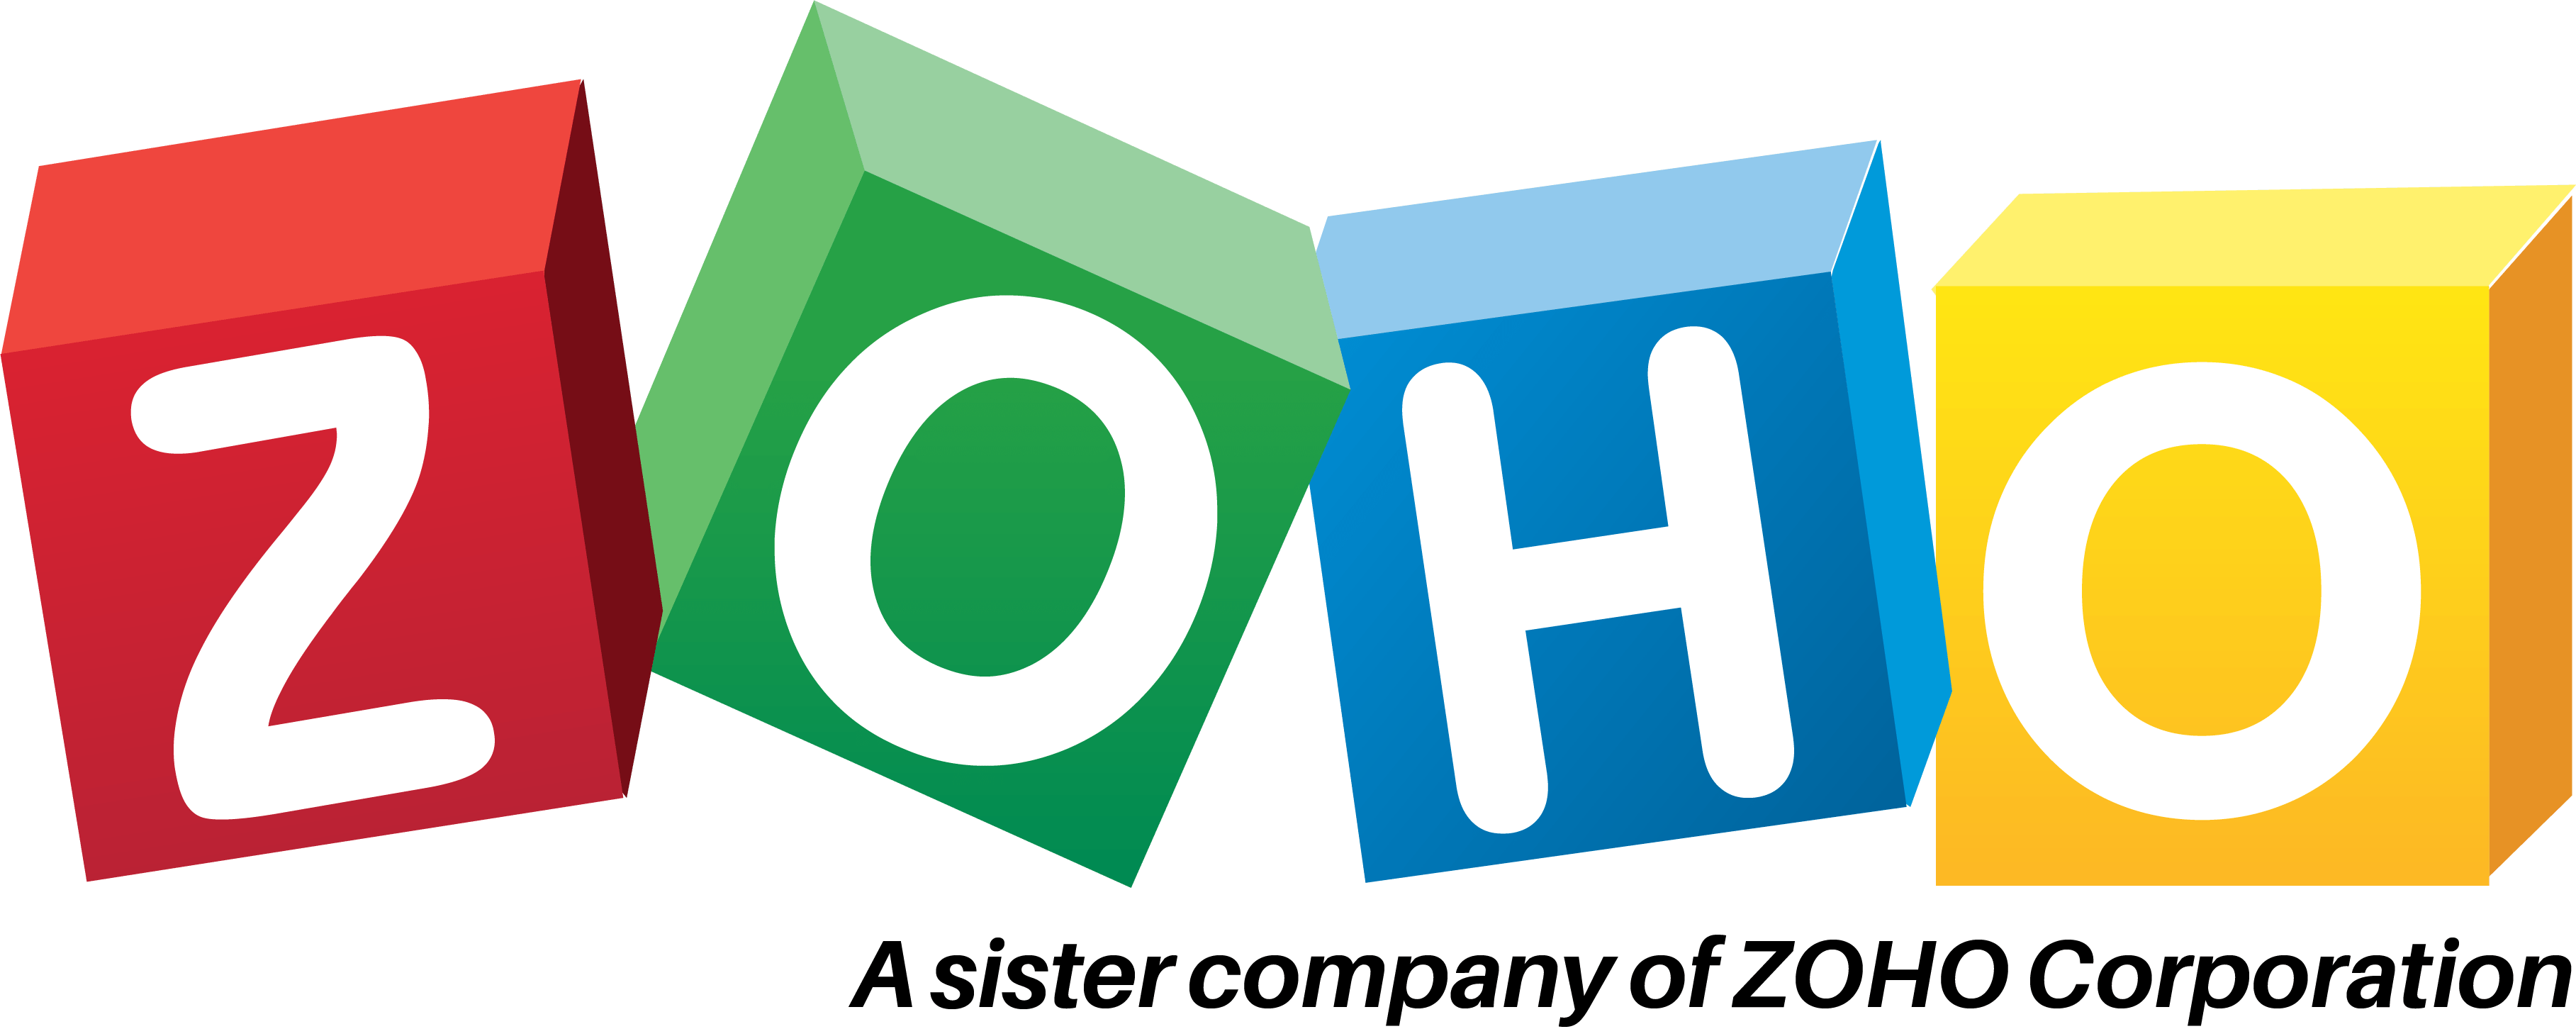 Zoho vs Salesforce vs Messenger Bot, Is Zoho better than Salesforce?, Is Zoho owned by Salesforce?, Is Zoho the same as Salesforce?, Why is Zoho so cheap?, CRM Software